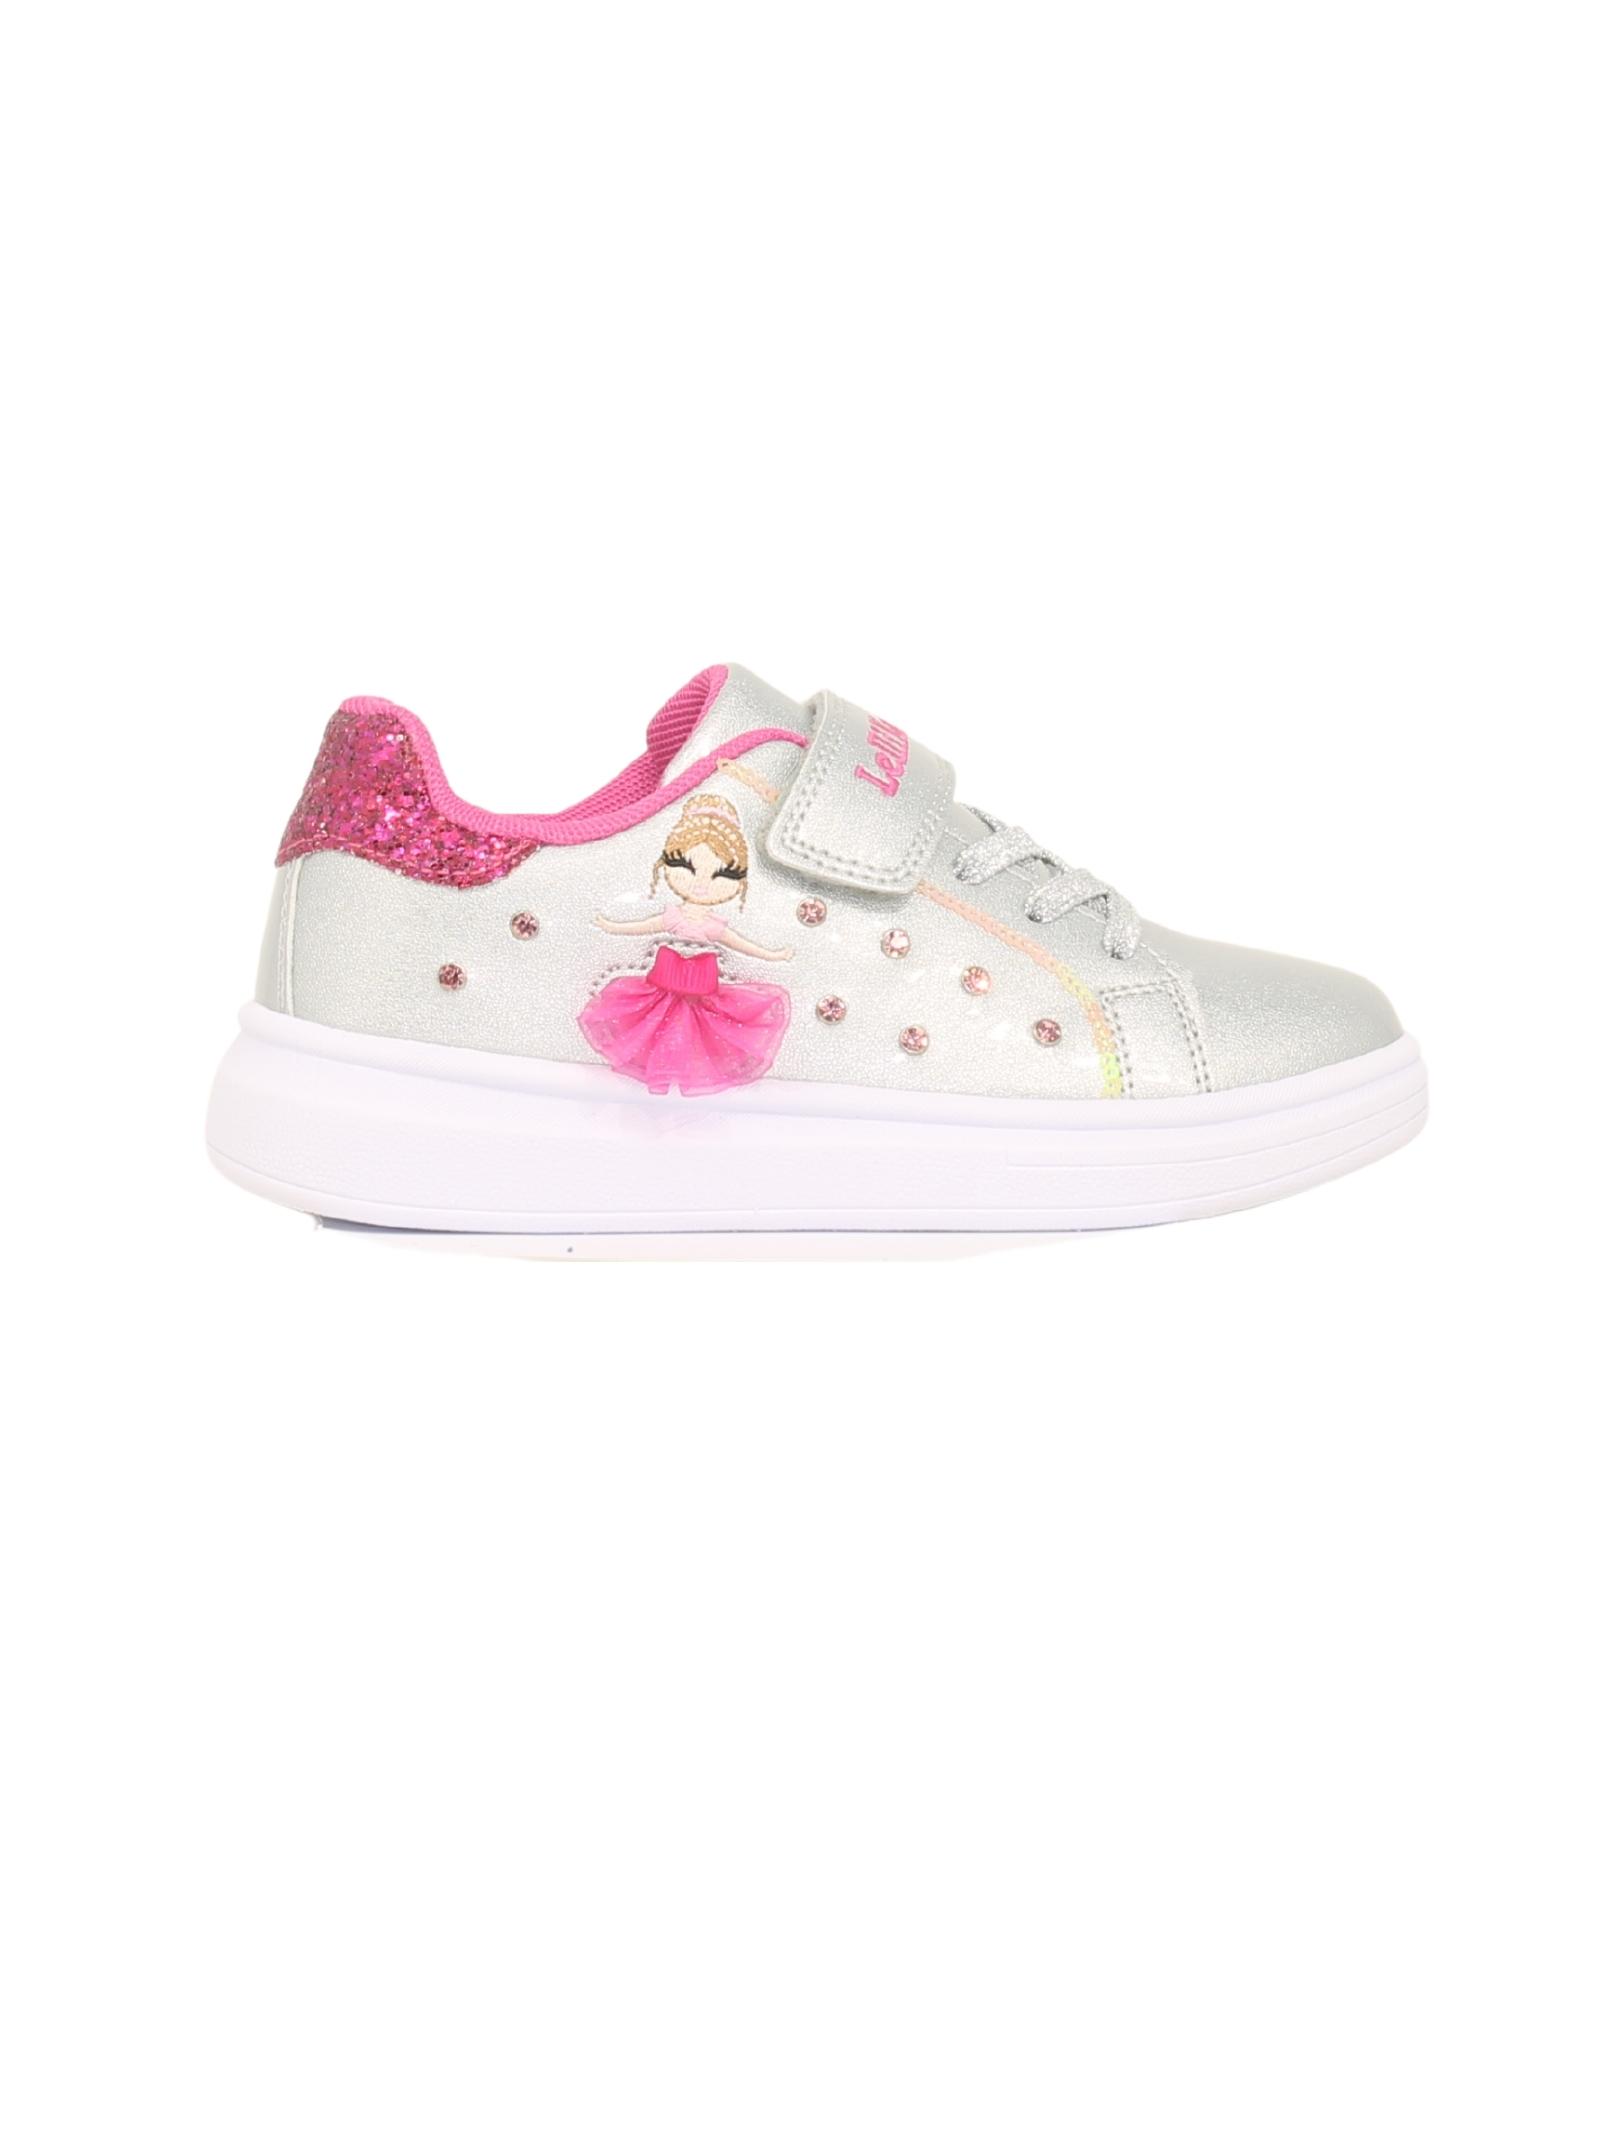 Sneakers Brillantini Bambina LELLI KELLY | Sneakers | LK4826ARGENTO